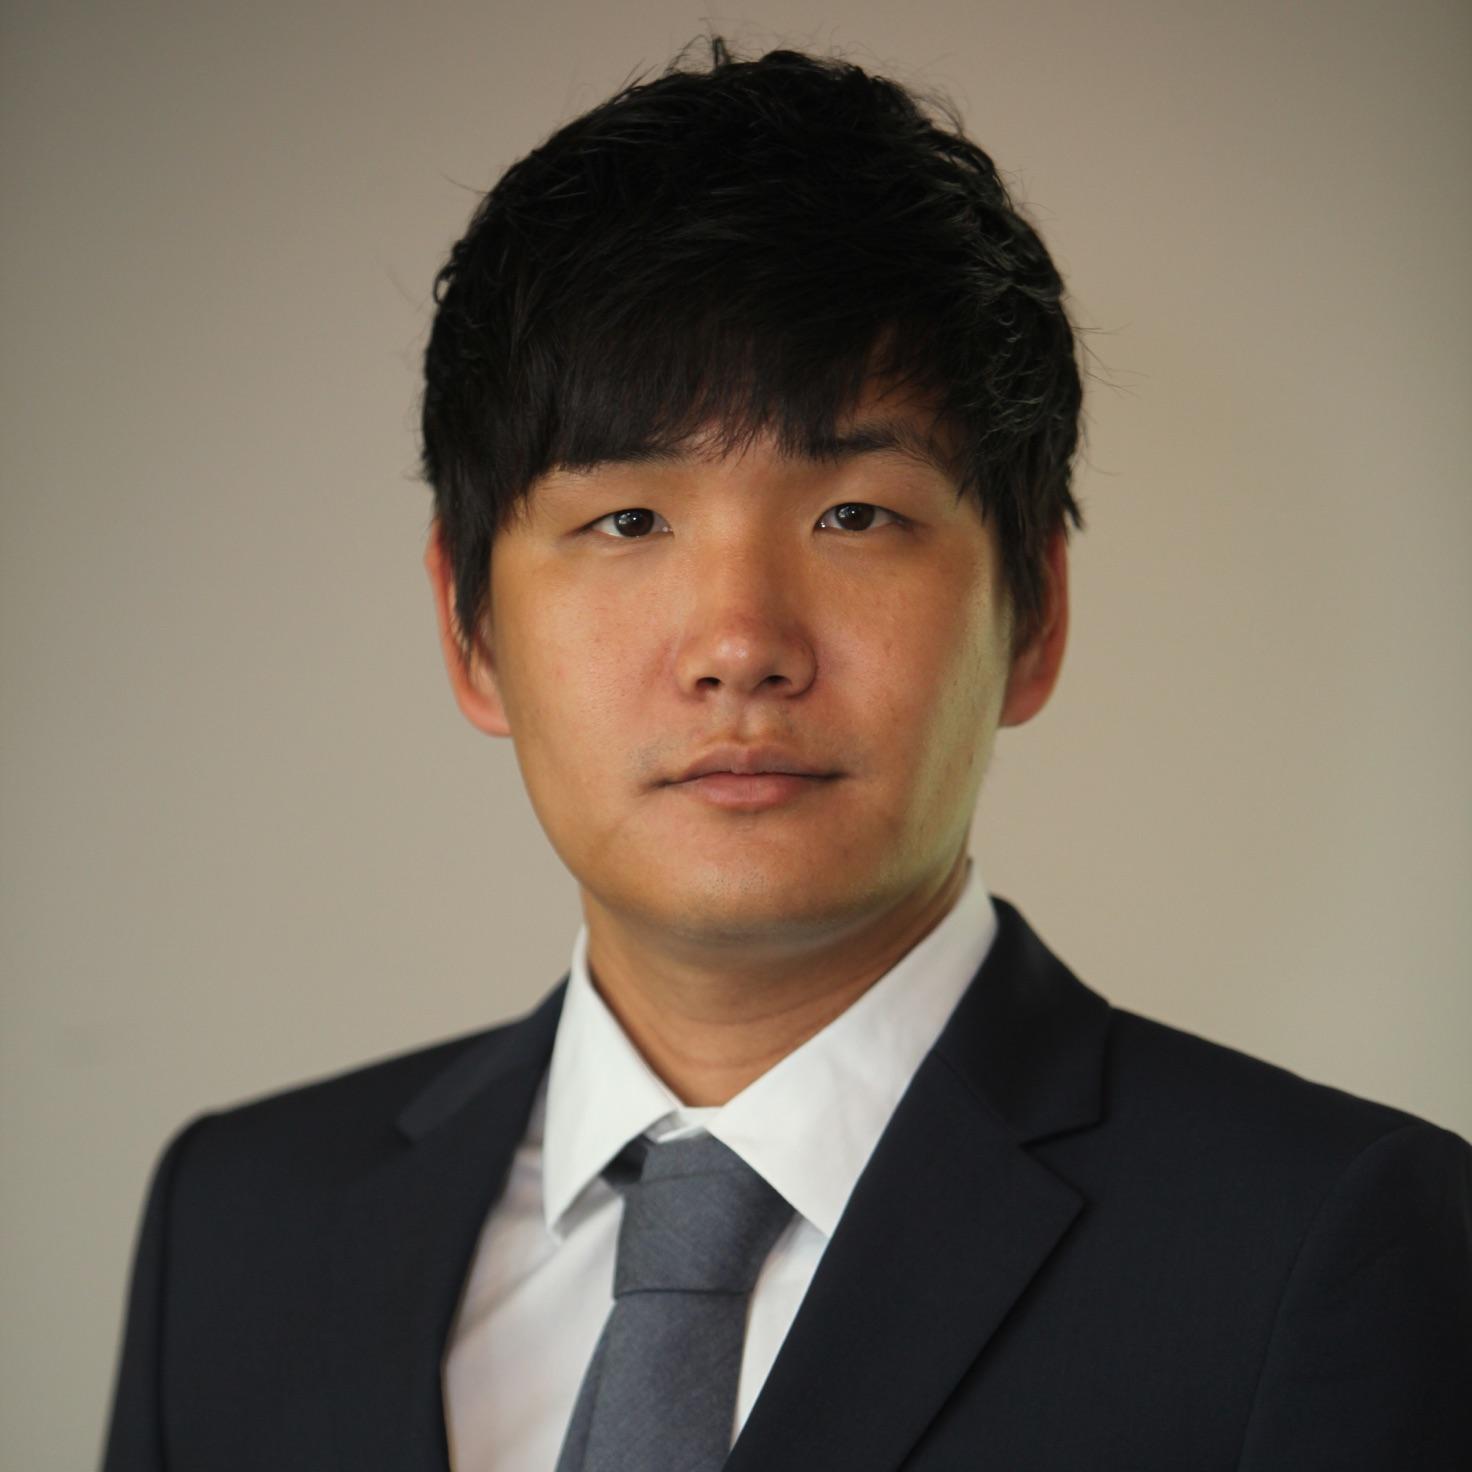 Portrait of Hyun Jong Park